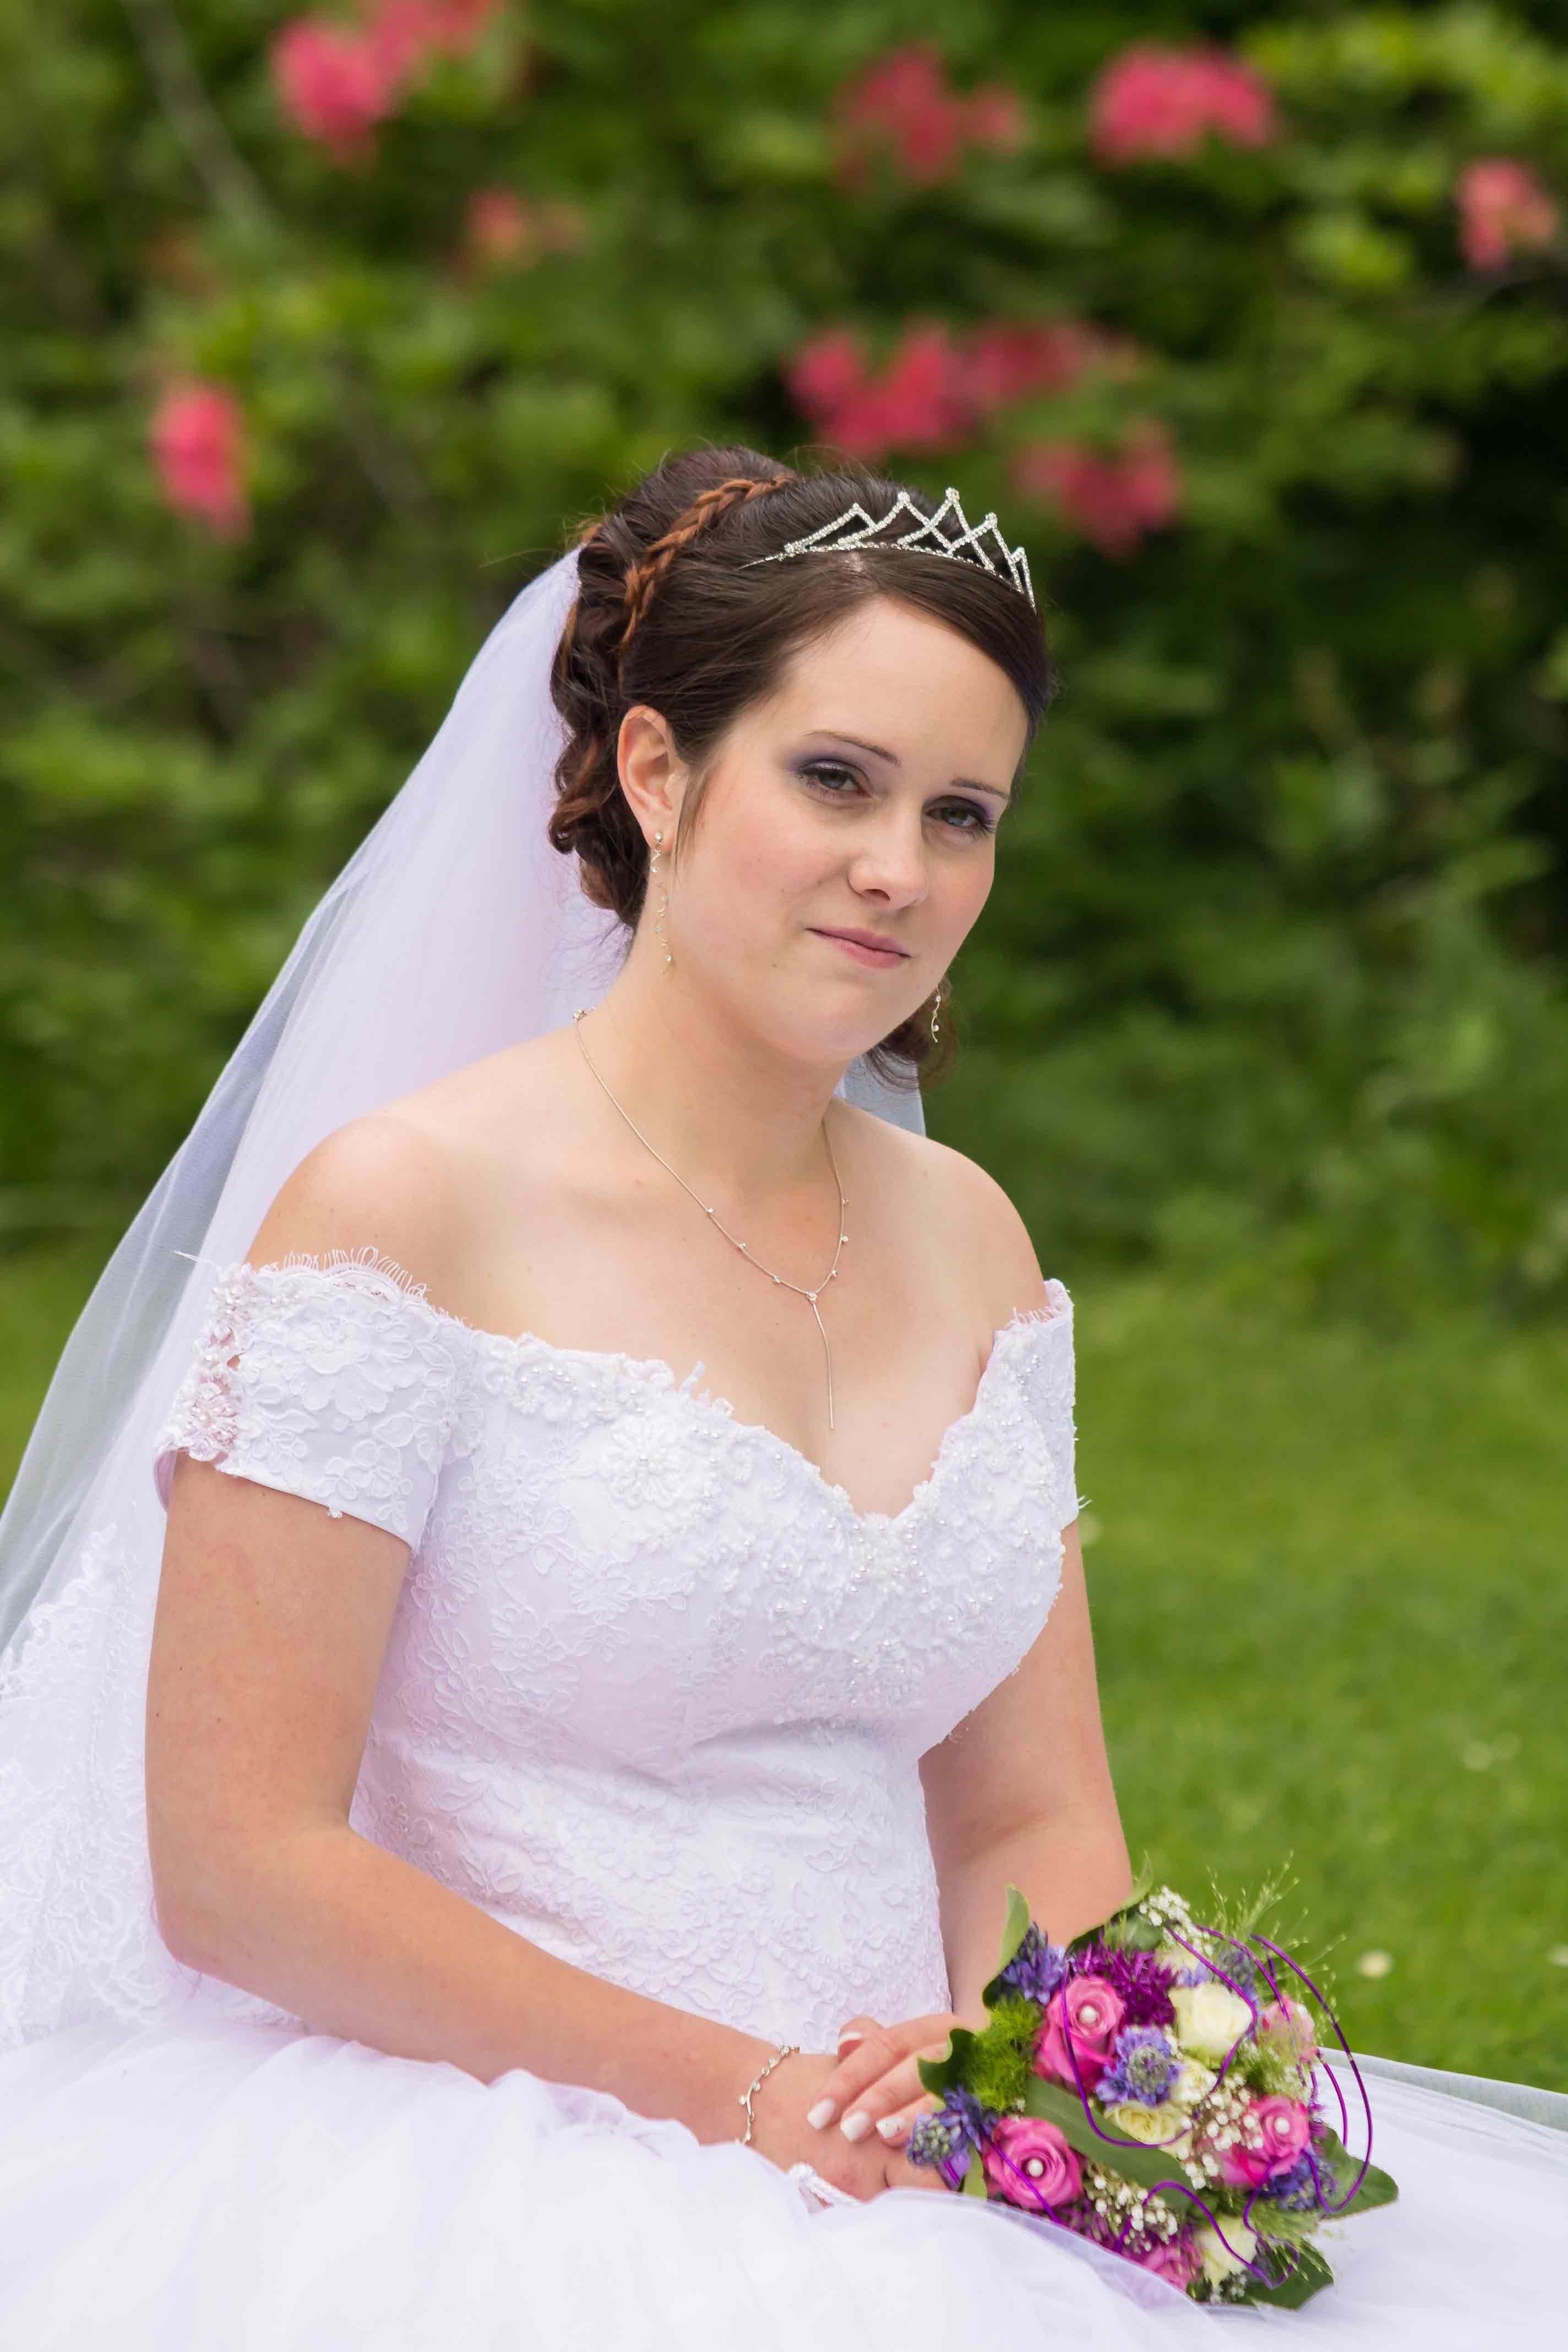 Hochzeitsfotografie-2378w